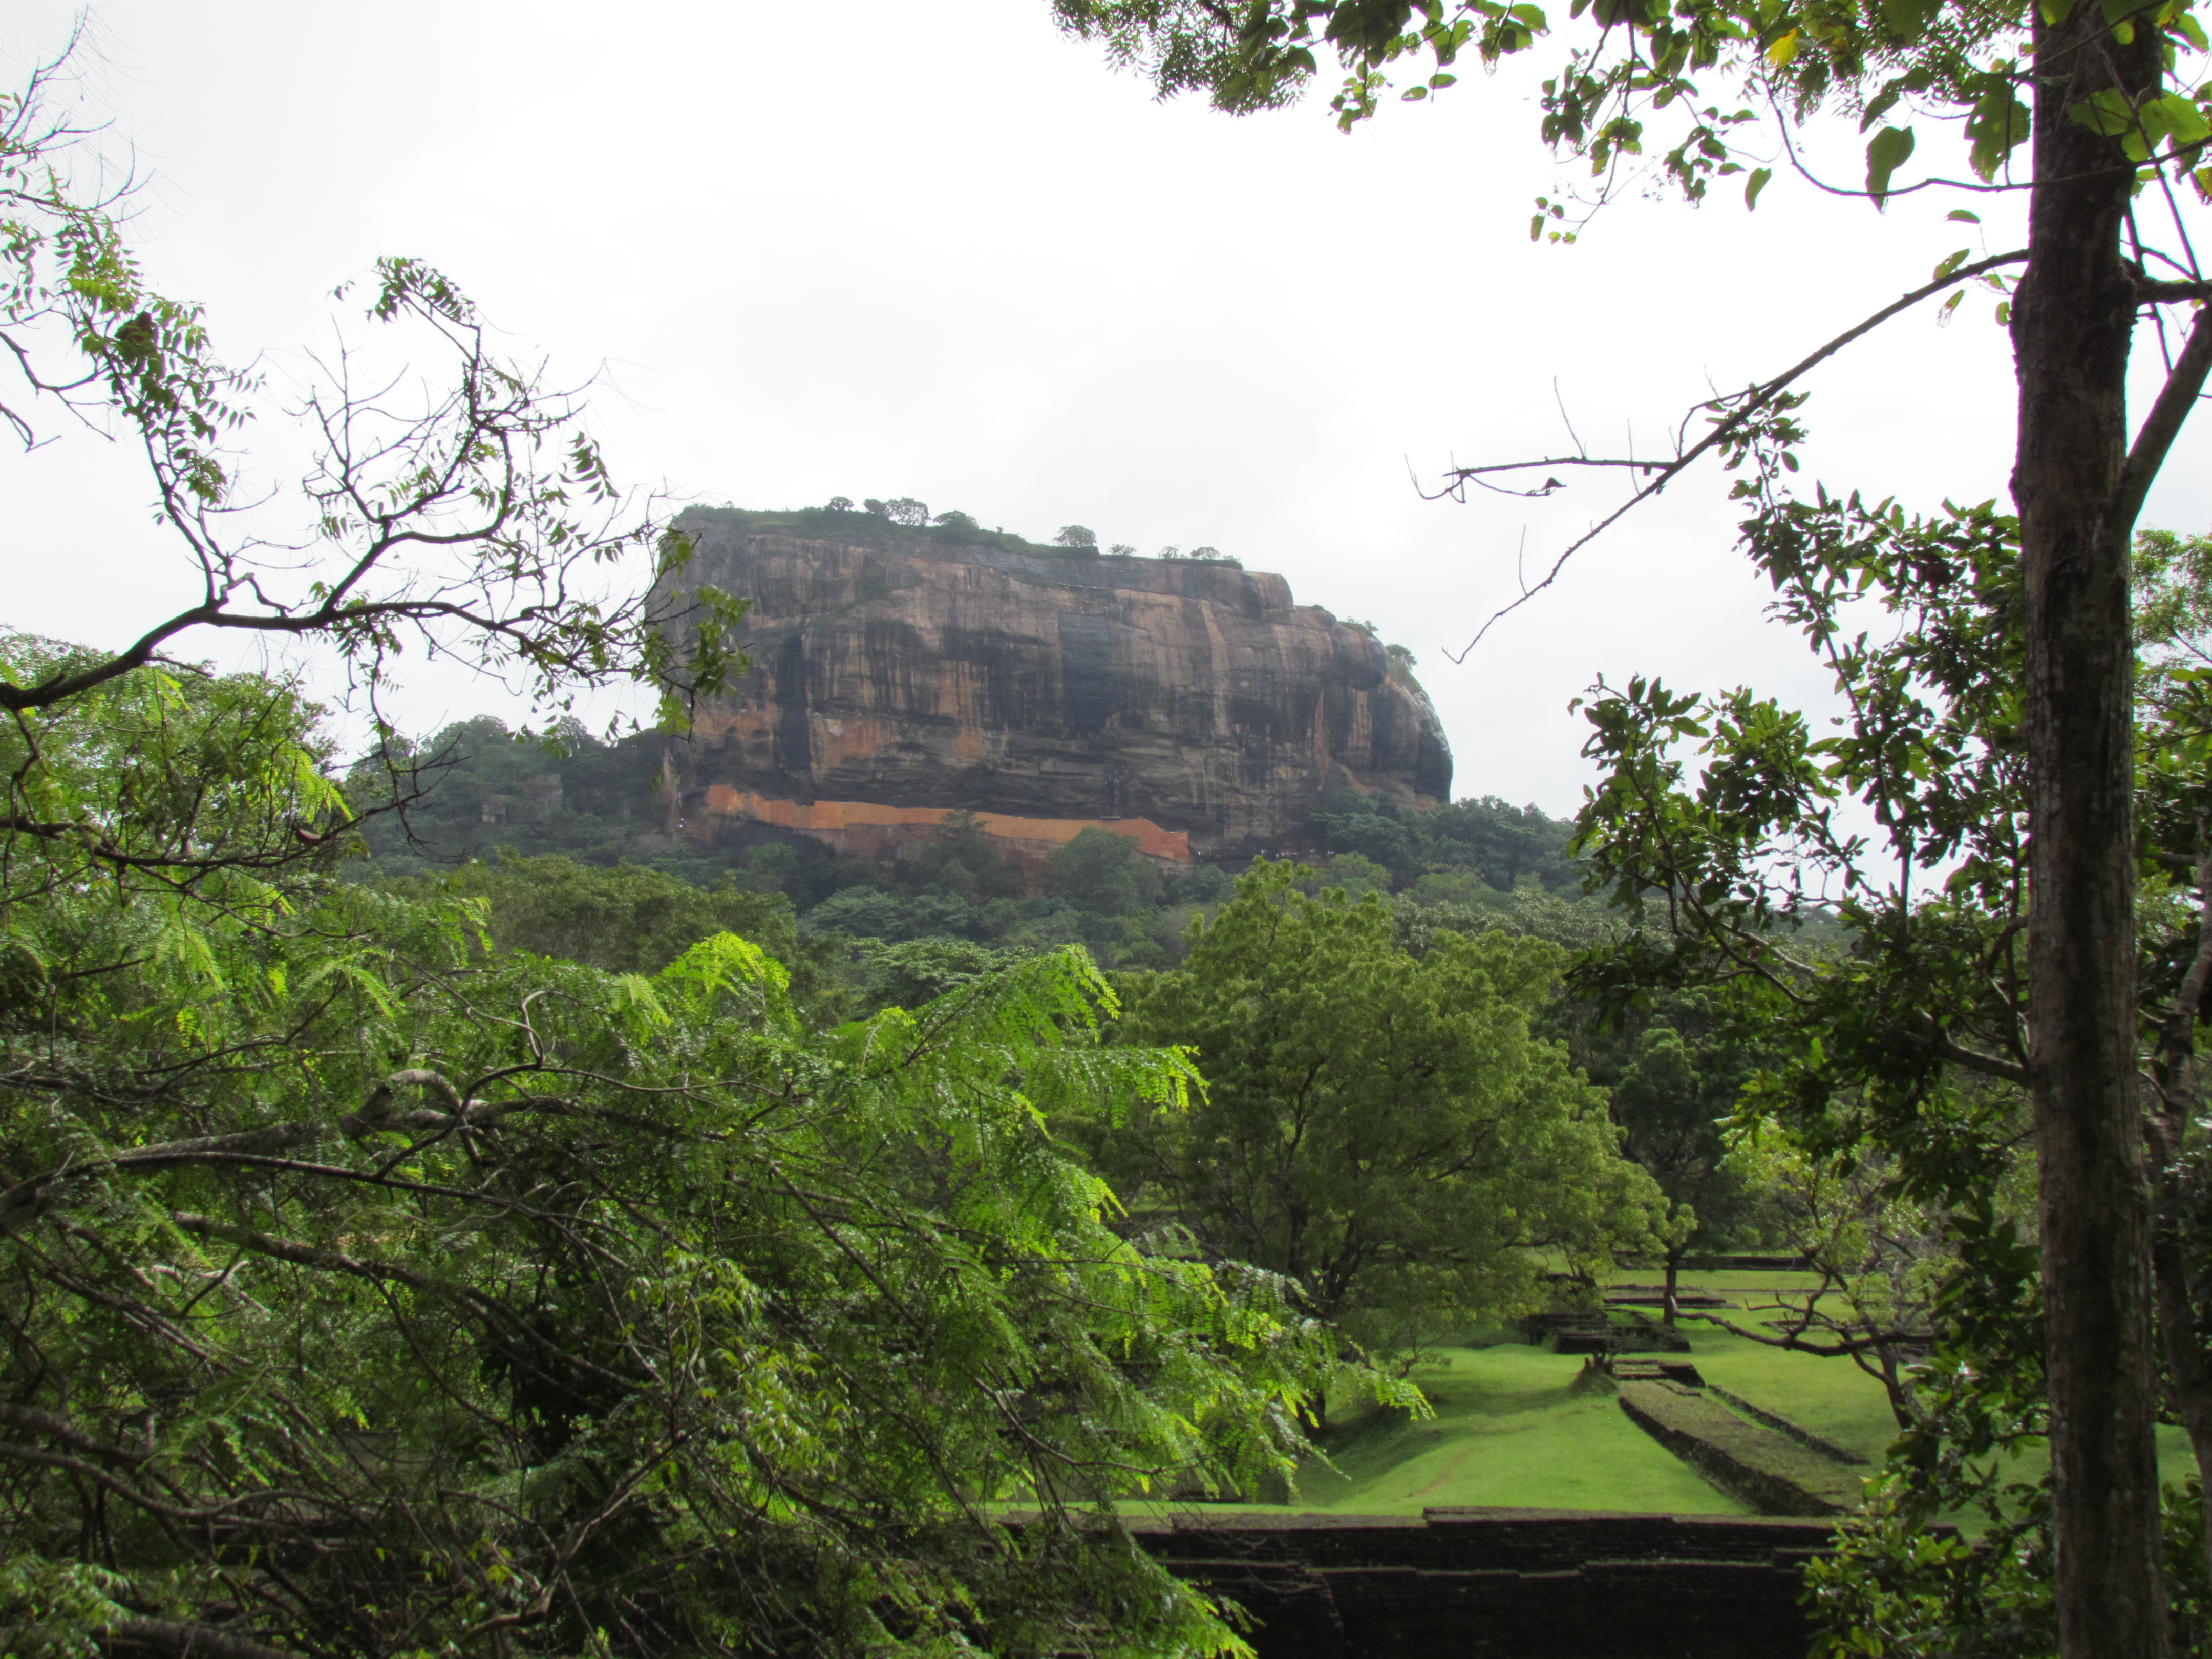 Sri Lanka, Sigiriya, Sigiriya Rock